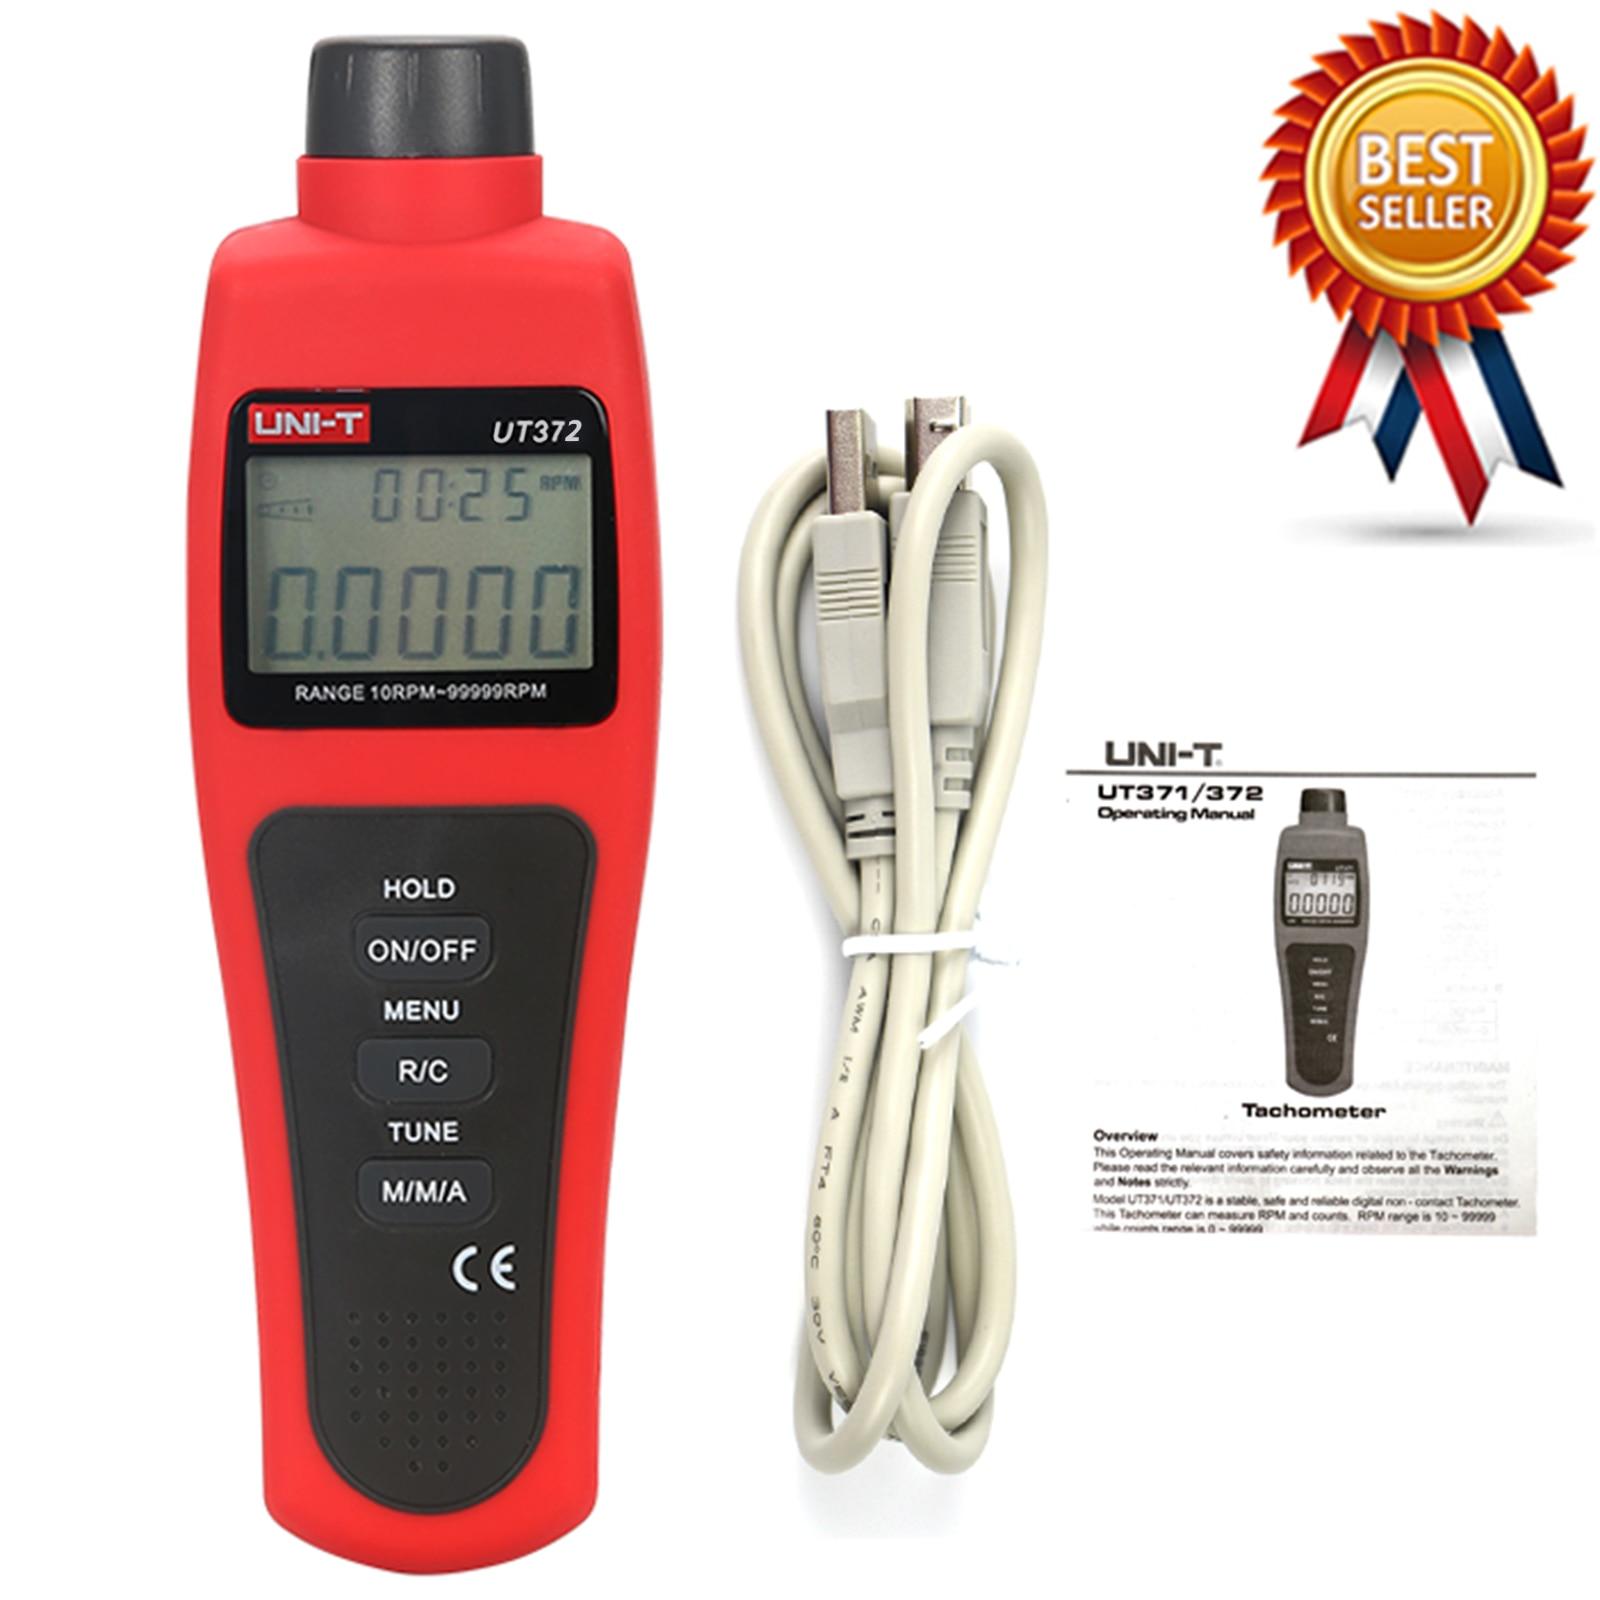 UNI-T UT372 عدم الاتصال مقاييس الدوران الهدف دورة في الدقيقة المدى 10 ~ 99999 ماكس/دقيقة/AVG اختبار المسافة 5 ~ 20 سنتيمتر USB واجهة